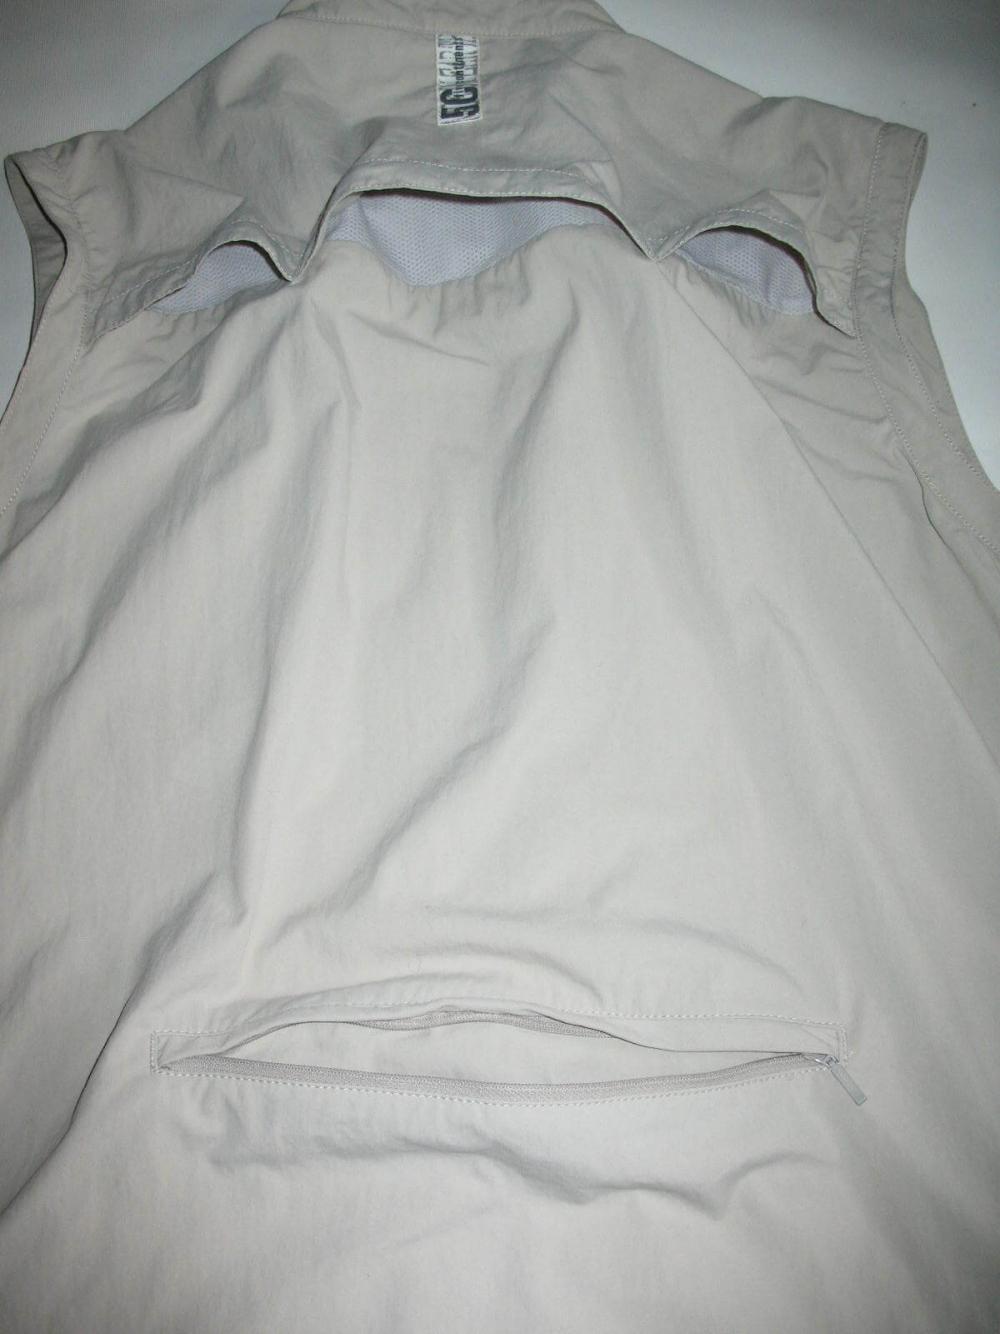 Жилет SALEWA quartz 5c dryton vest (размер 52-XL) - 8